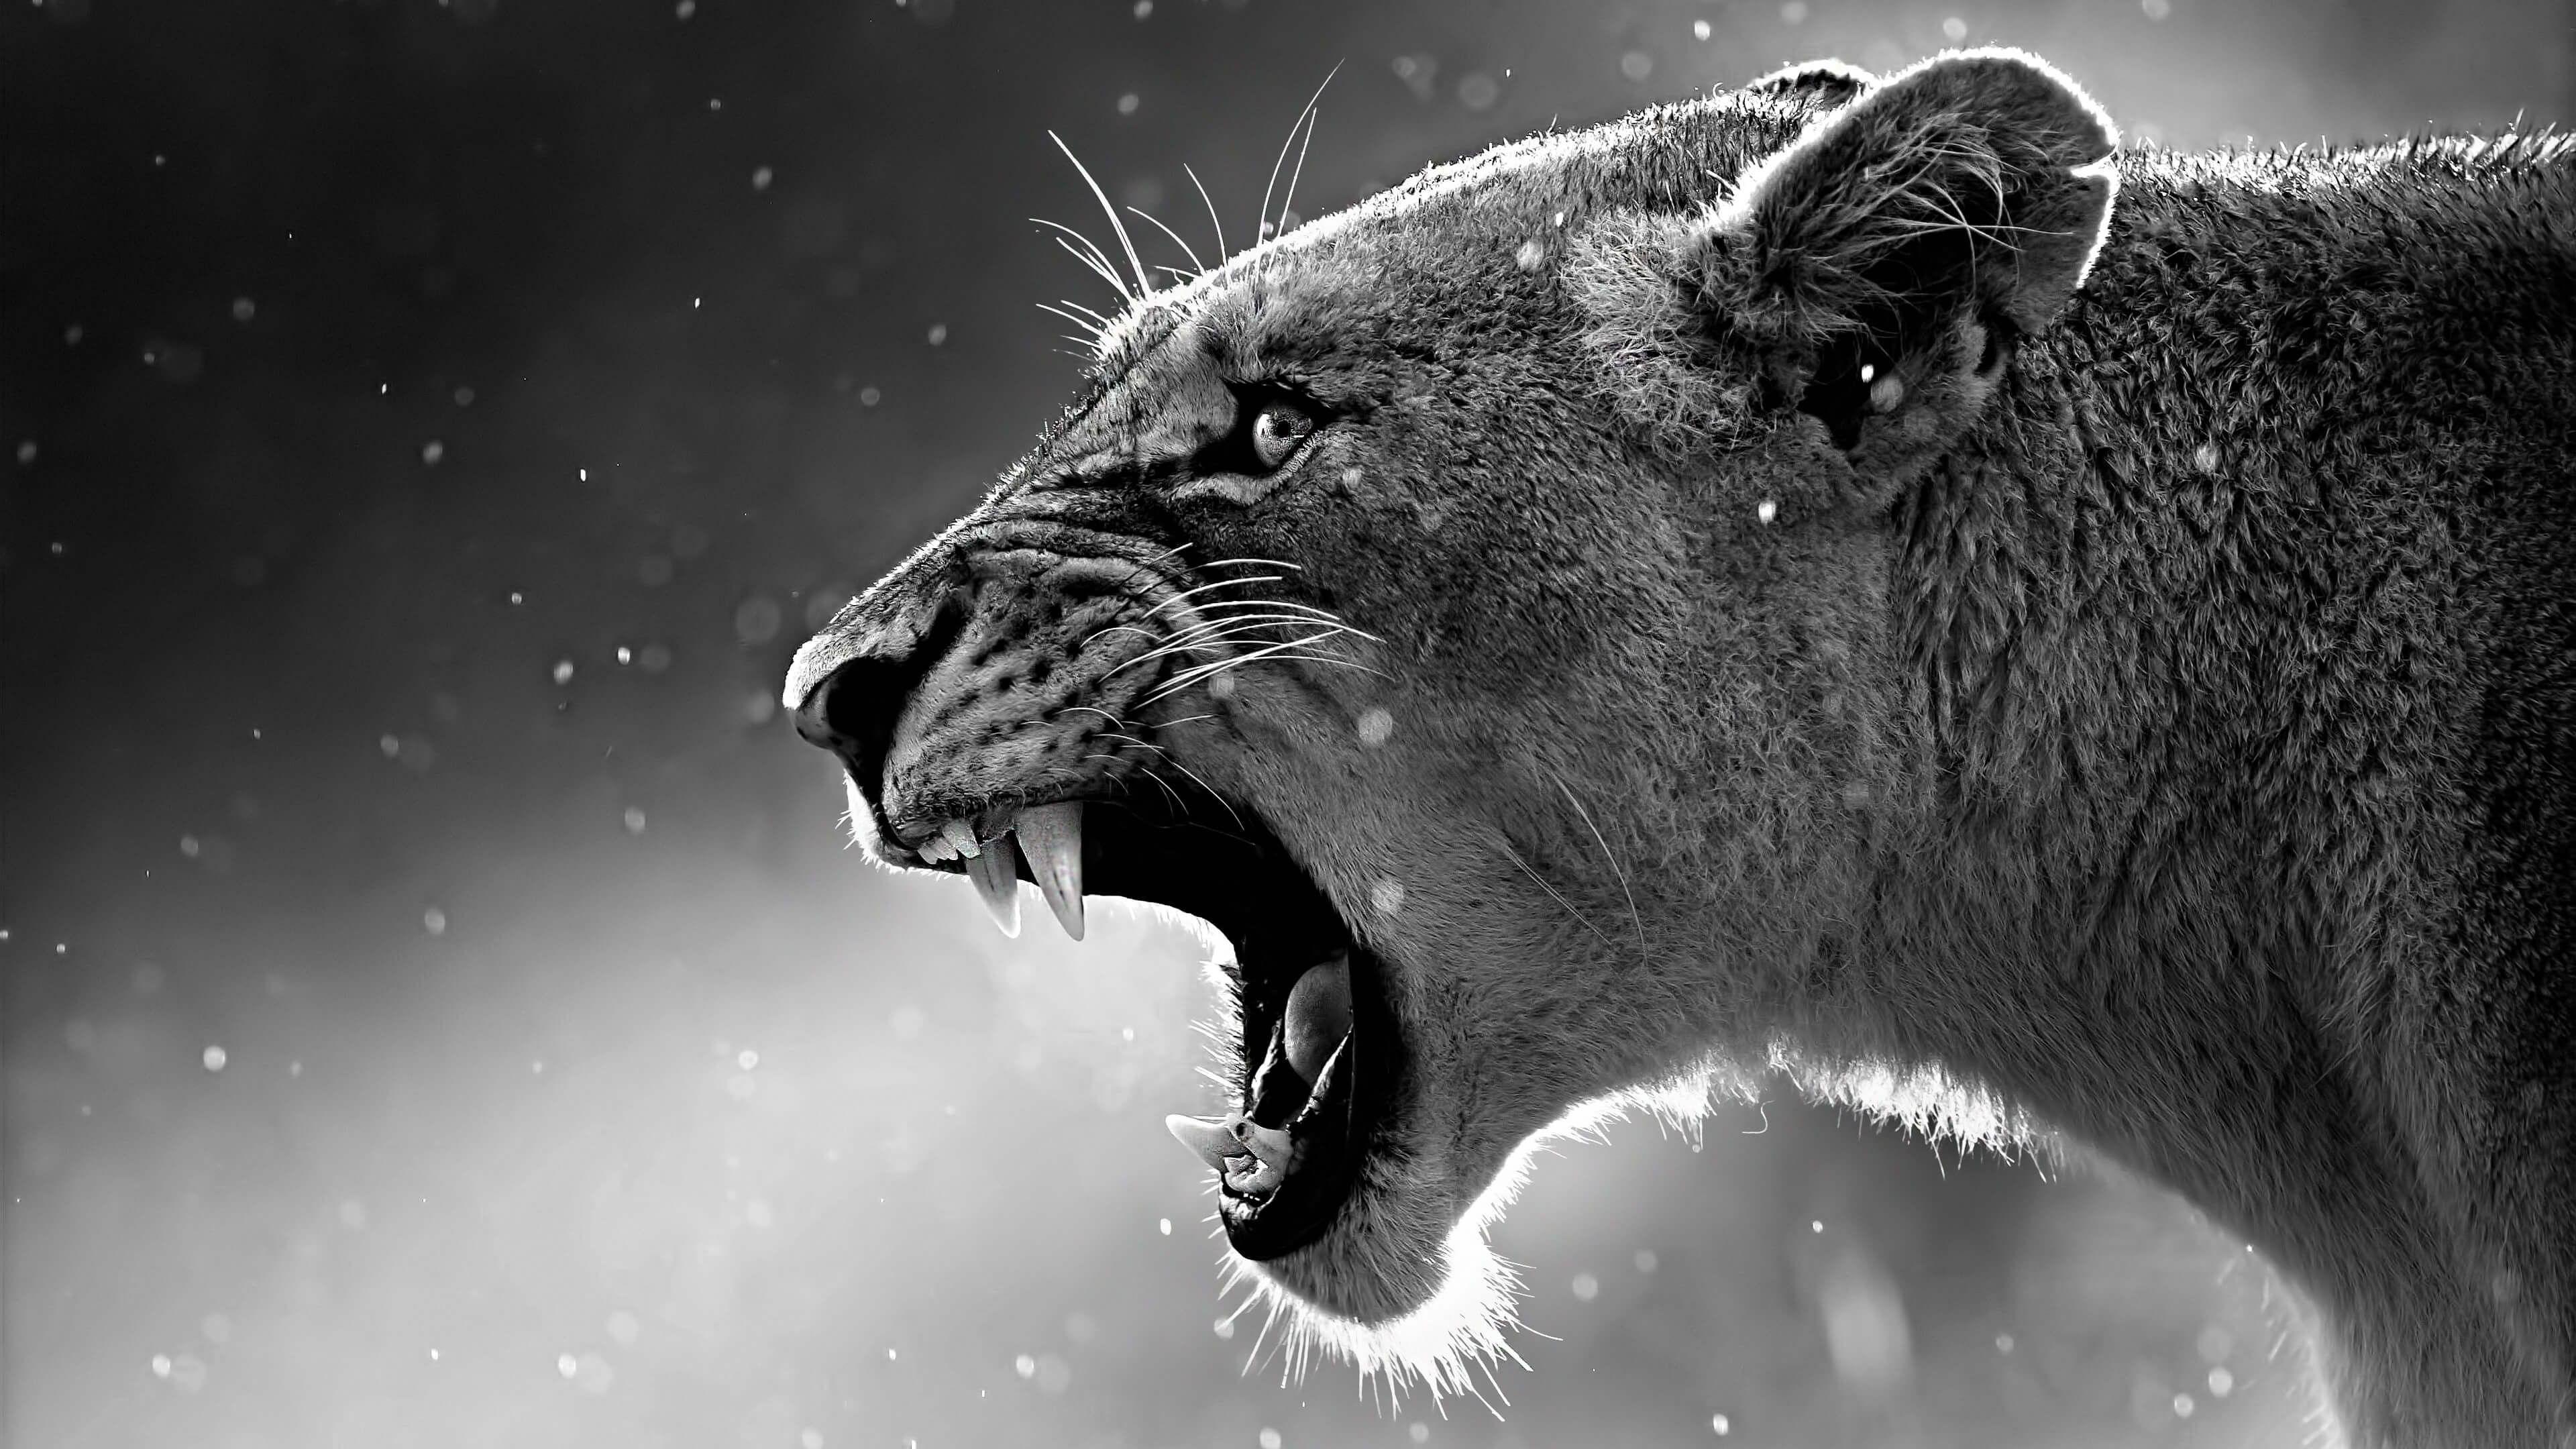 Free download Lion, Wild animals, Bugs, Birds Full HD Wallpaper ...